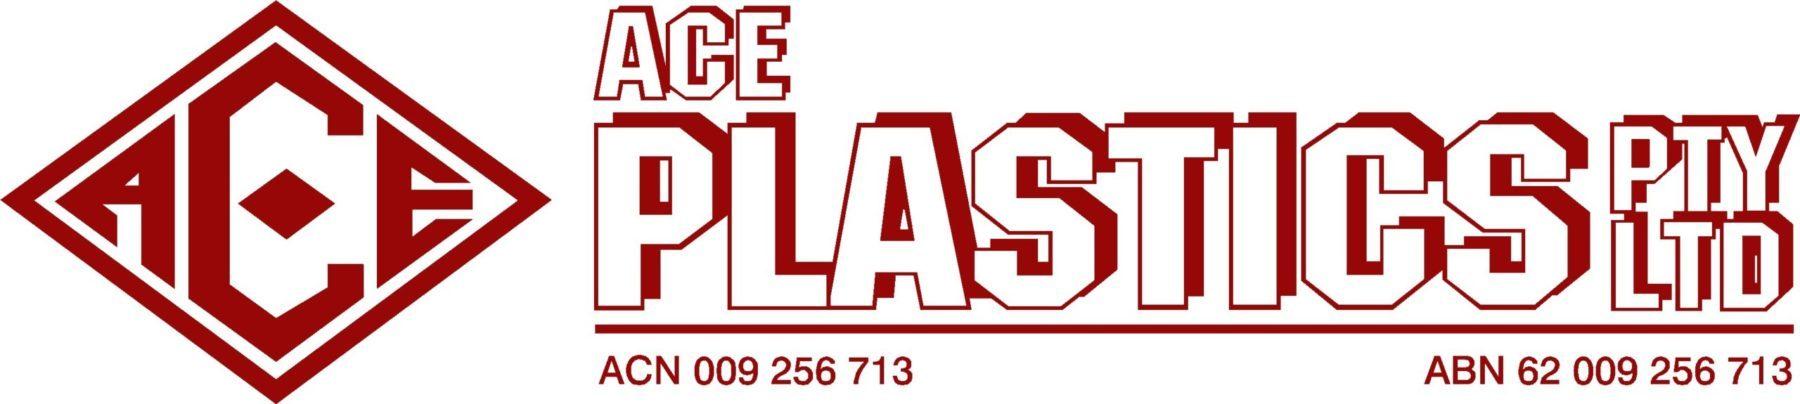 Ace Plastics PTY LTD